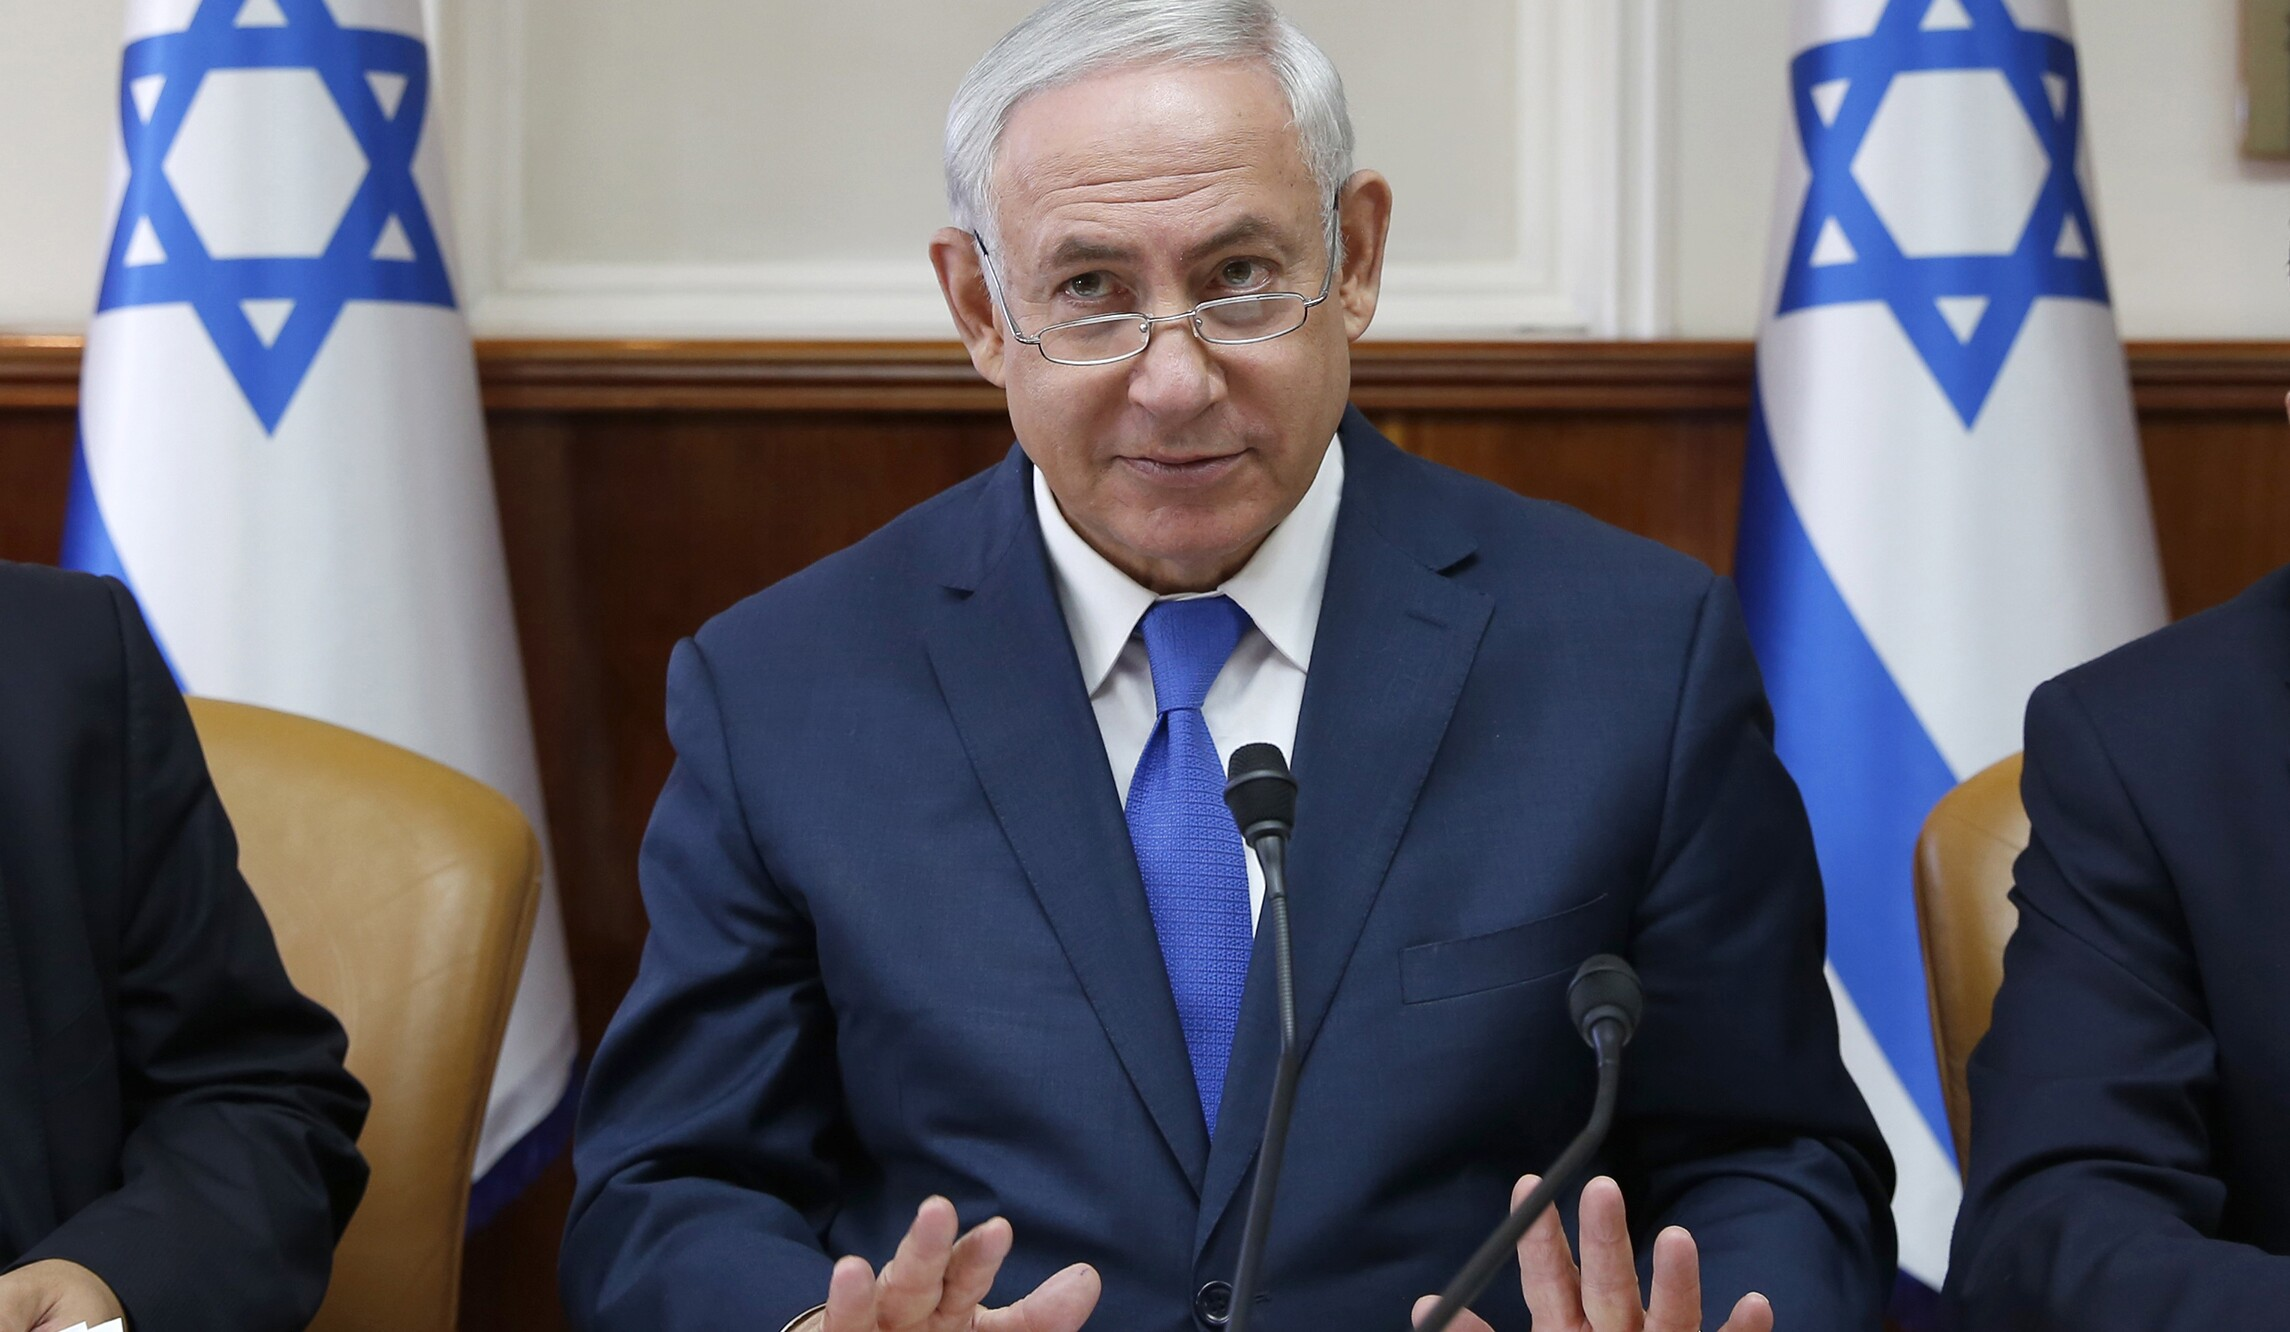 Benjamin Netanyahu Trump Made Very Brave Decision To Disavow Iran